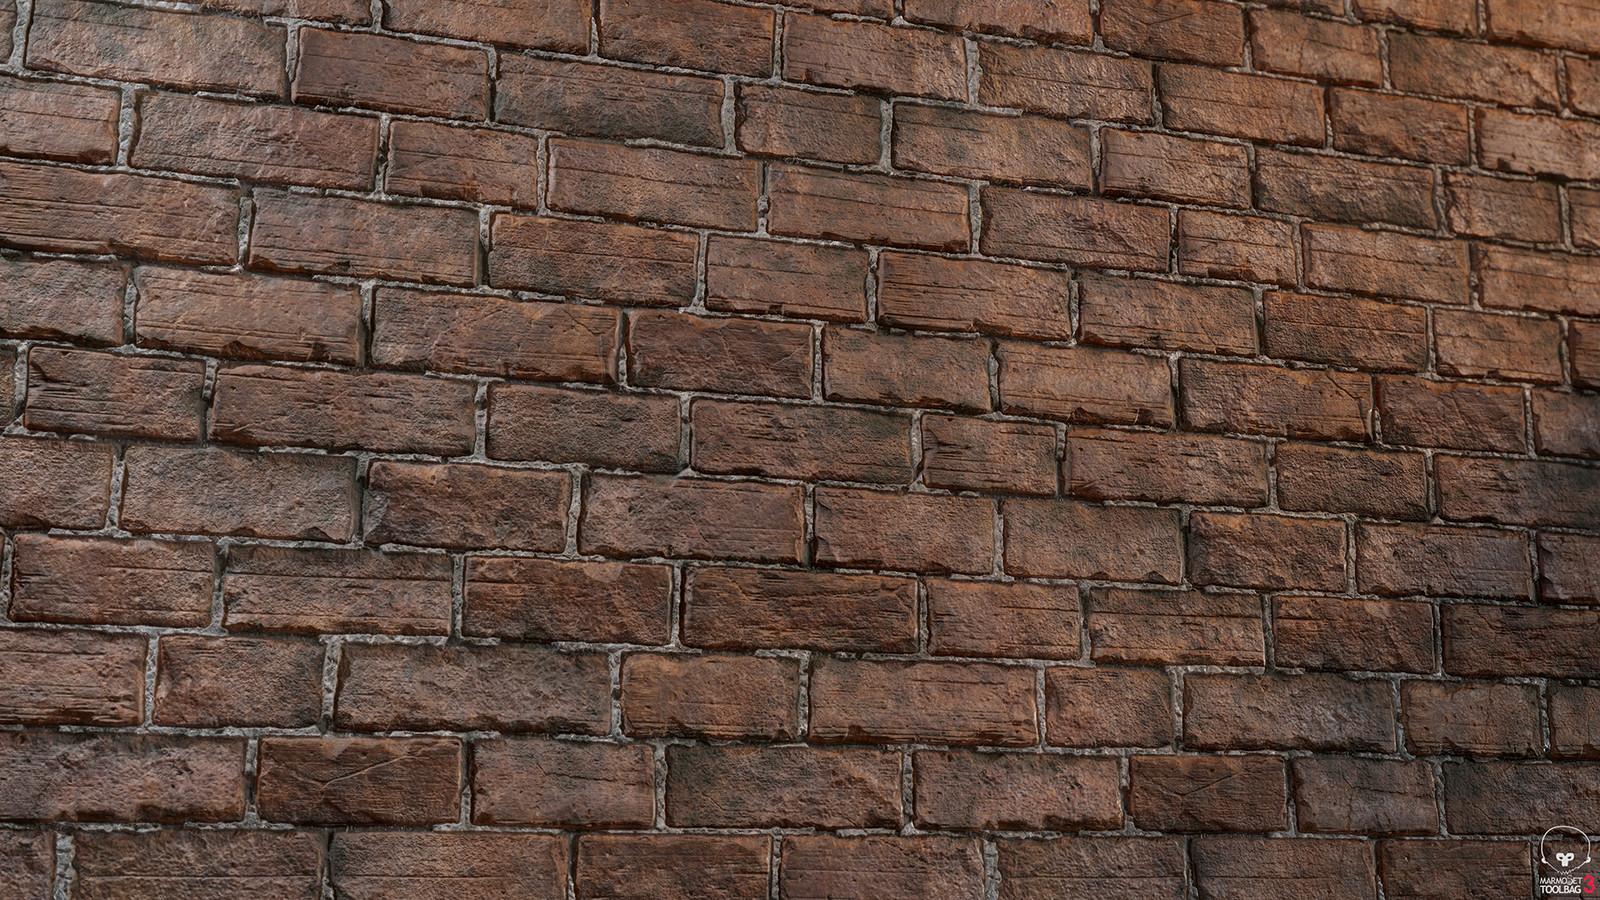 Inward Industrial Brick